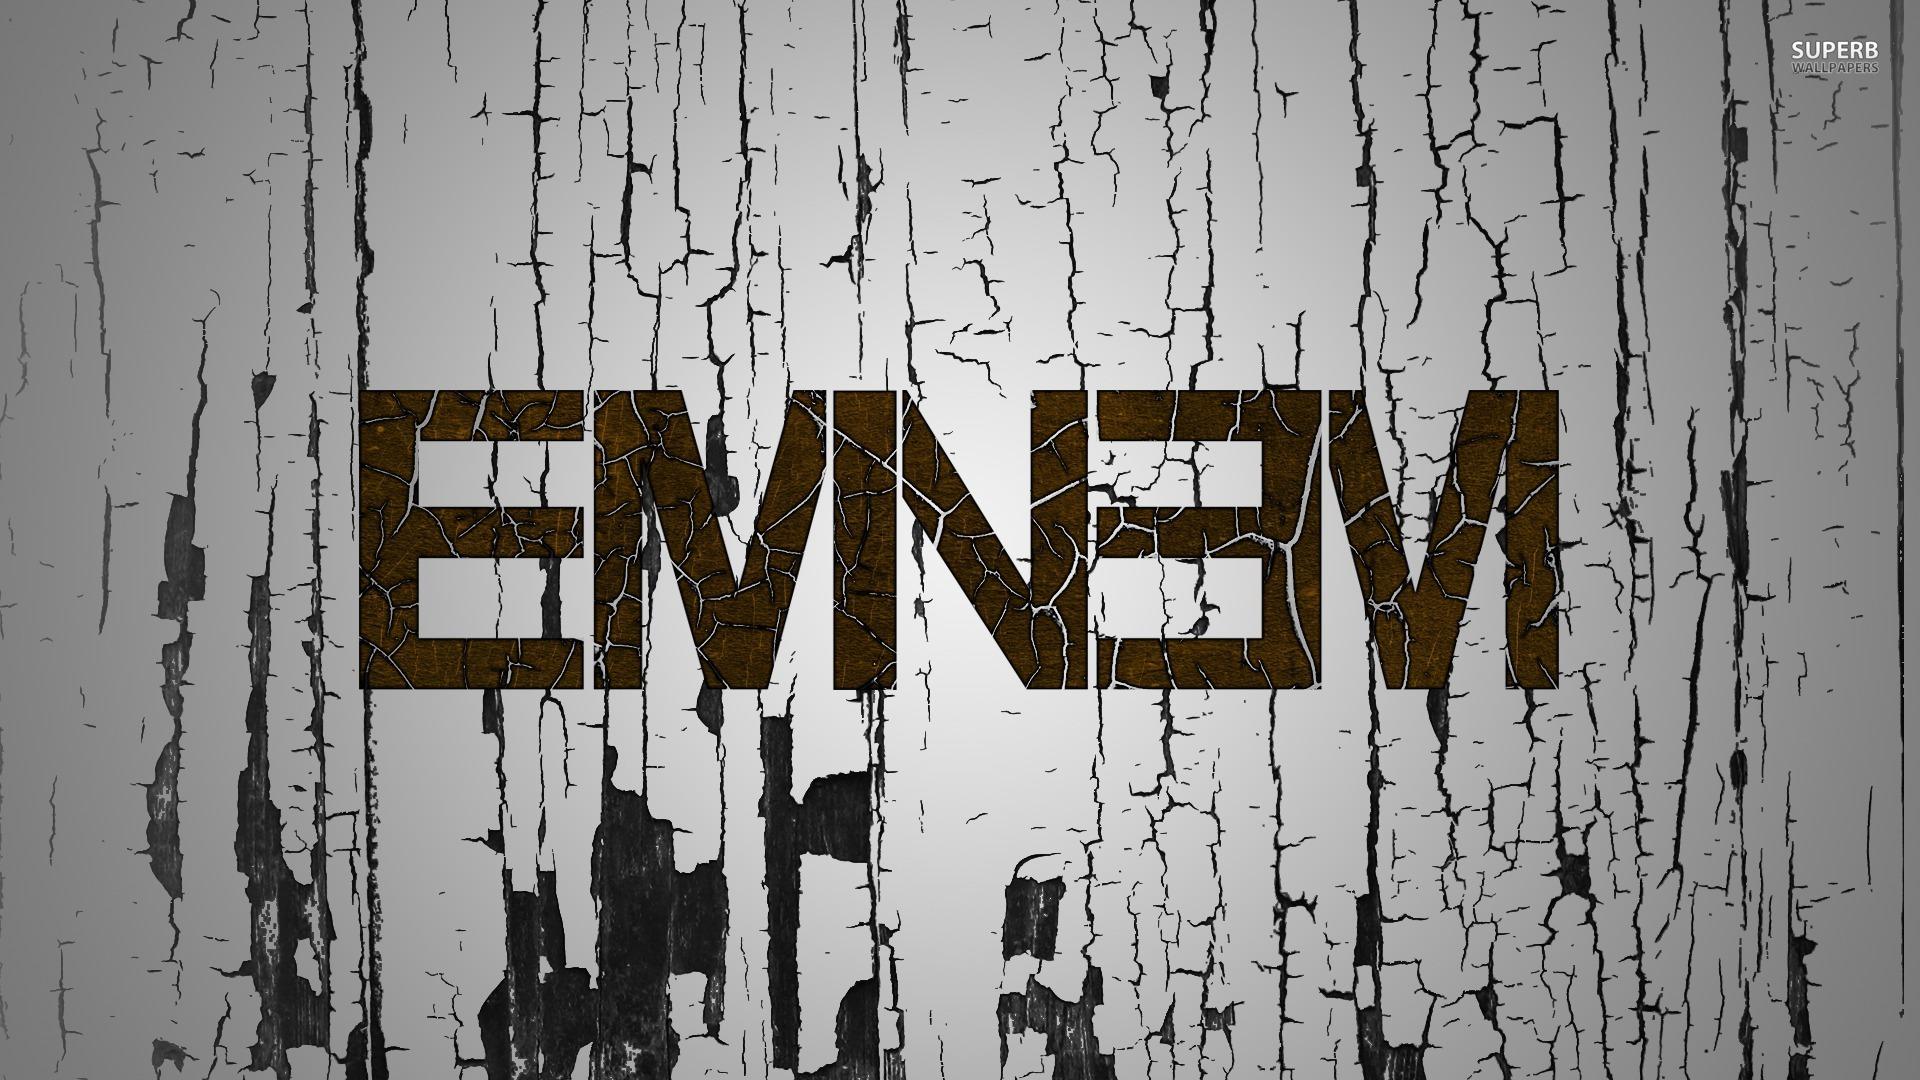 Buddha Hd Wallpaper 1080p Cool Eminem Quotes Rap Quotesgram